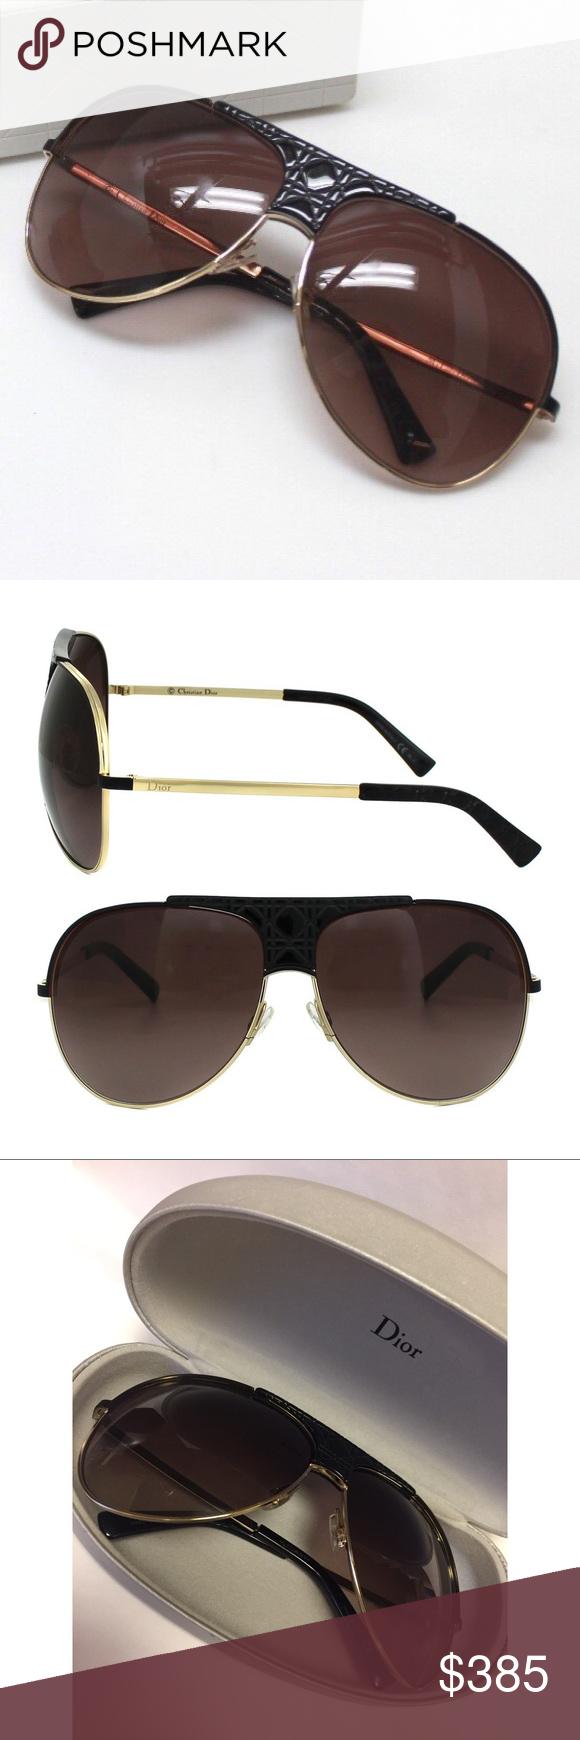 b5e0c14cdad7 DIOR Sunglasses